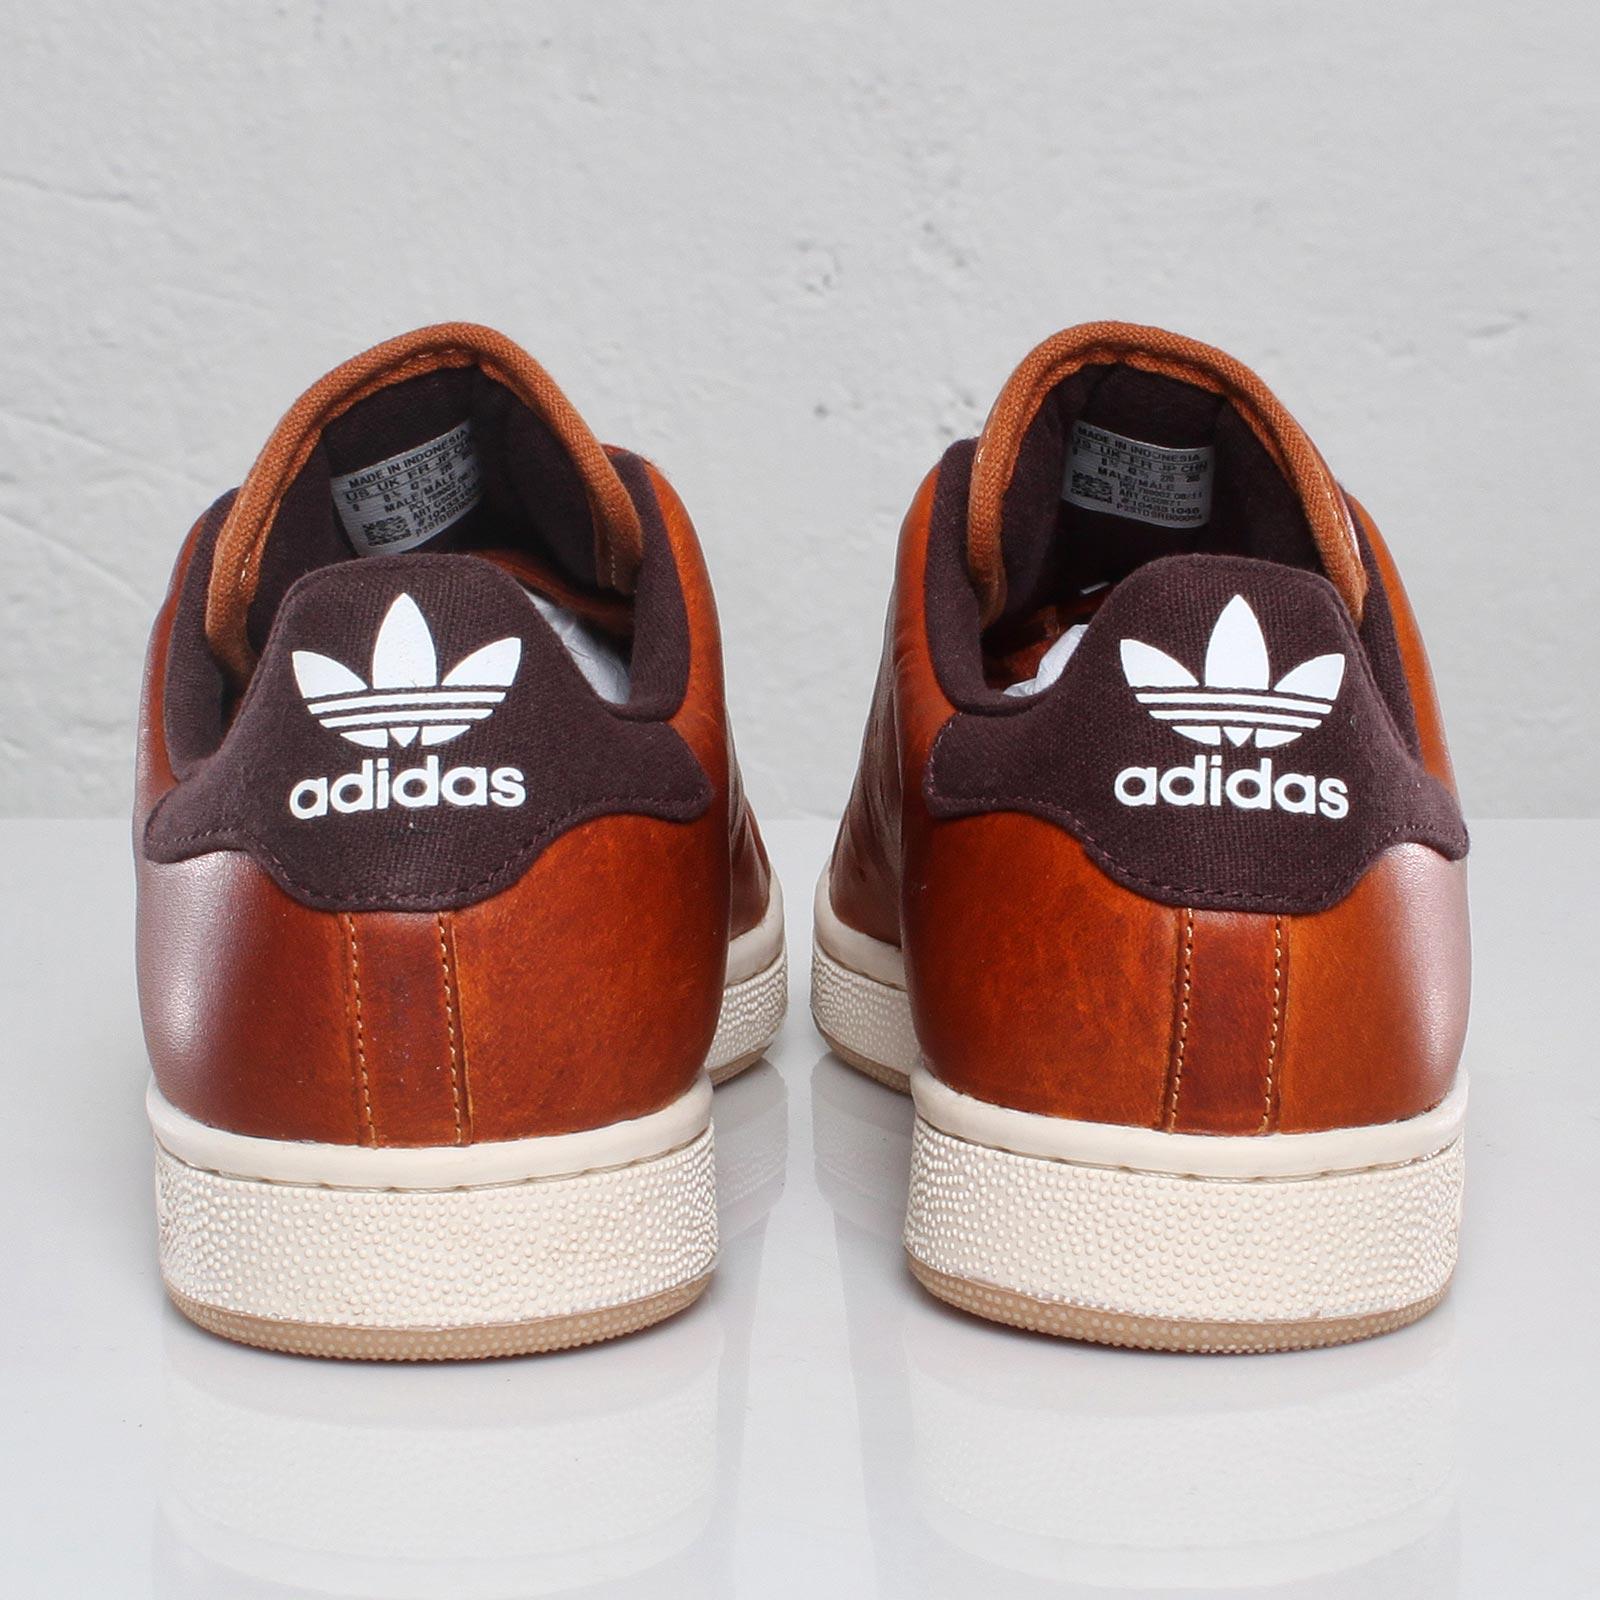 adidas Stan Smith 2 - 102312 - Sneakersnstuff I Sneakers ...